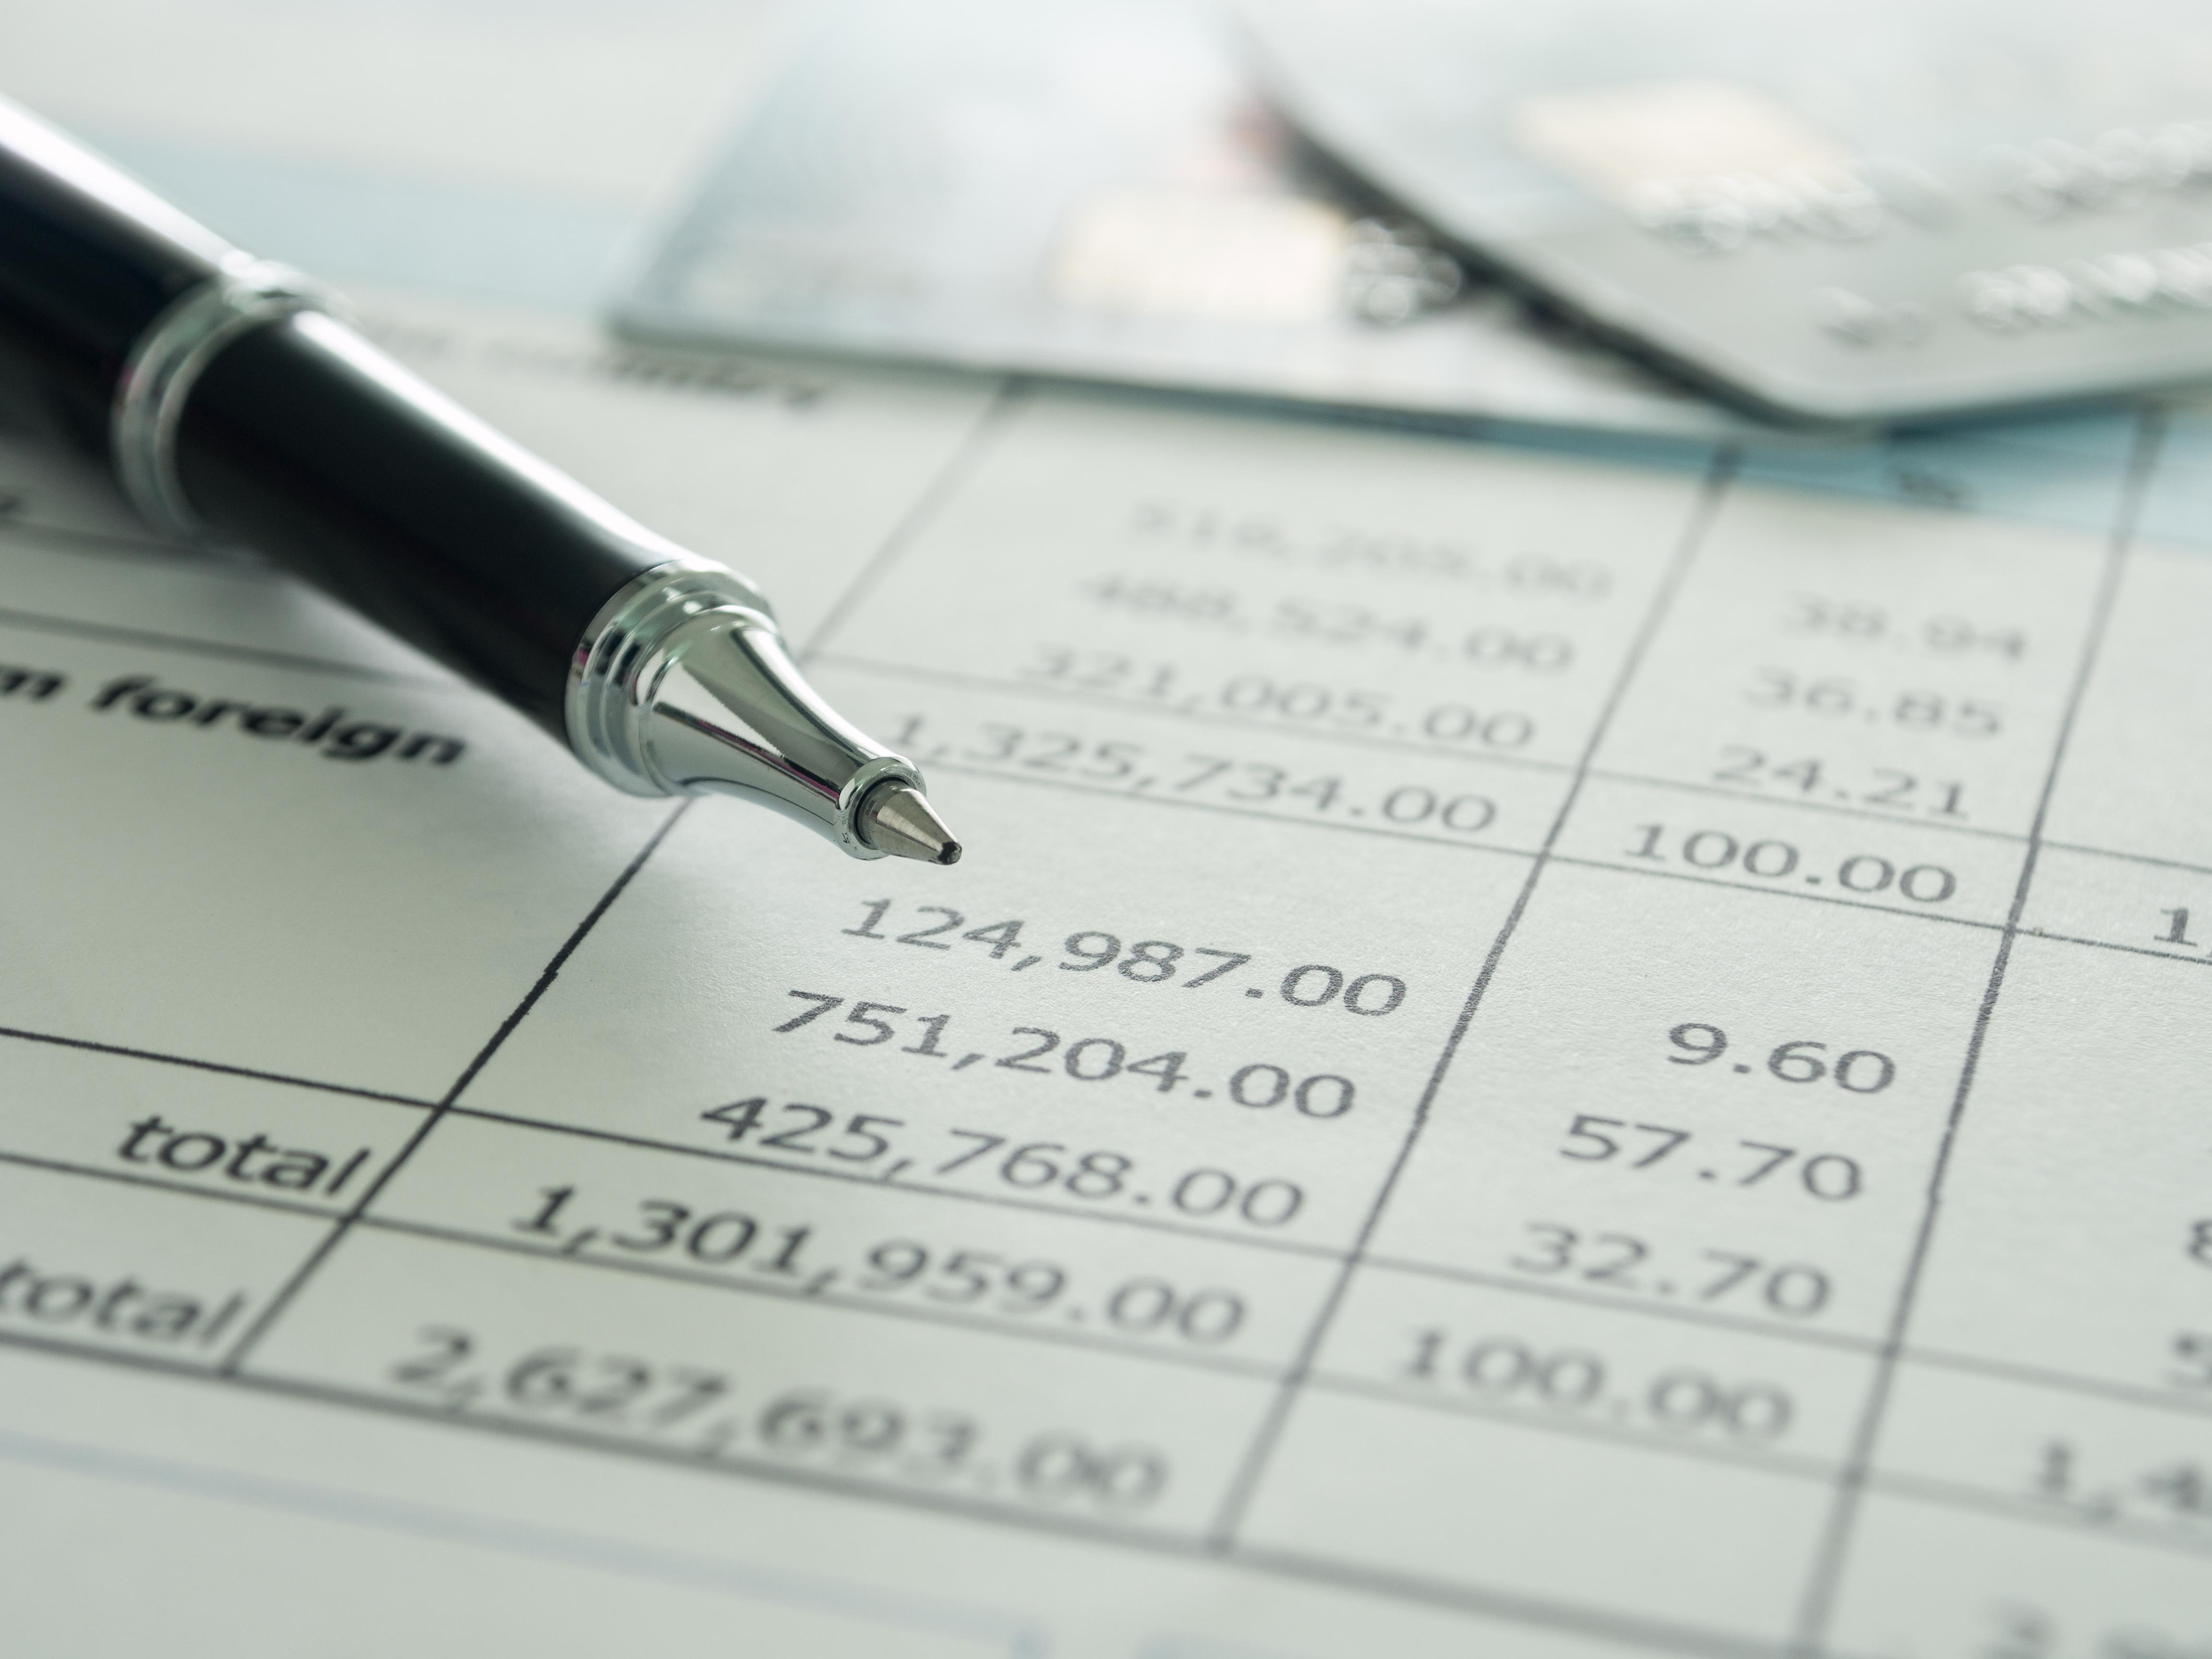 Ballpoint pen and financial statement